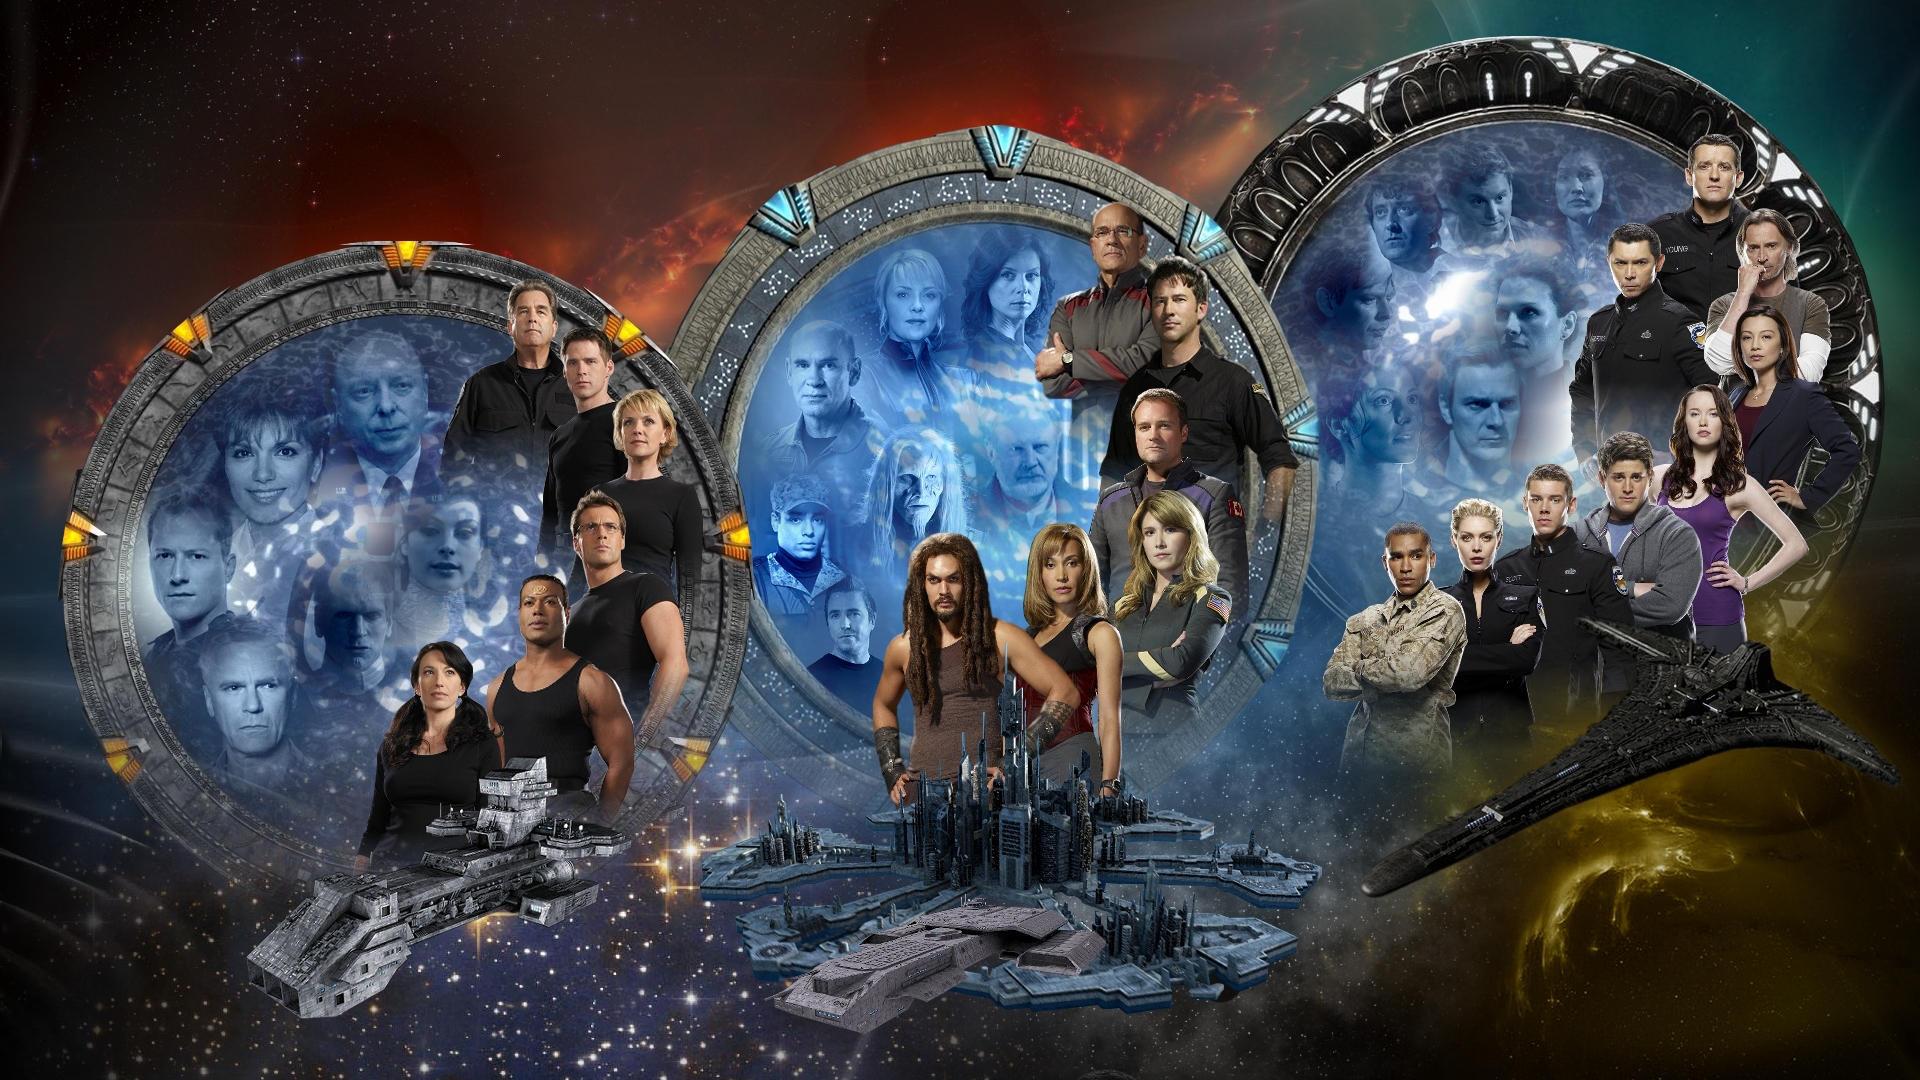 Stargate Wallpaper By Lordradim On Deviantart